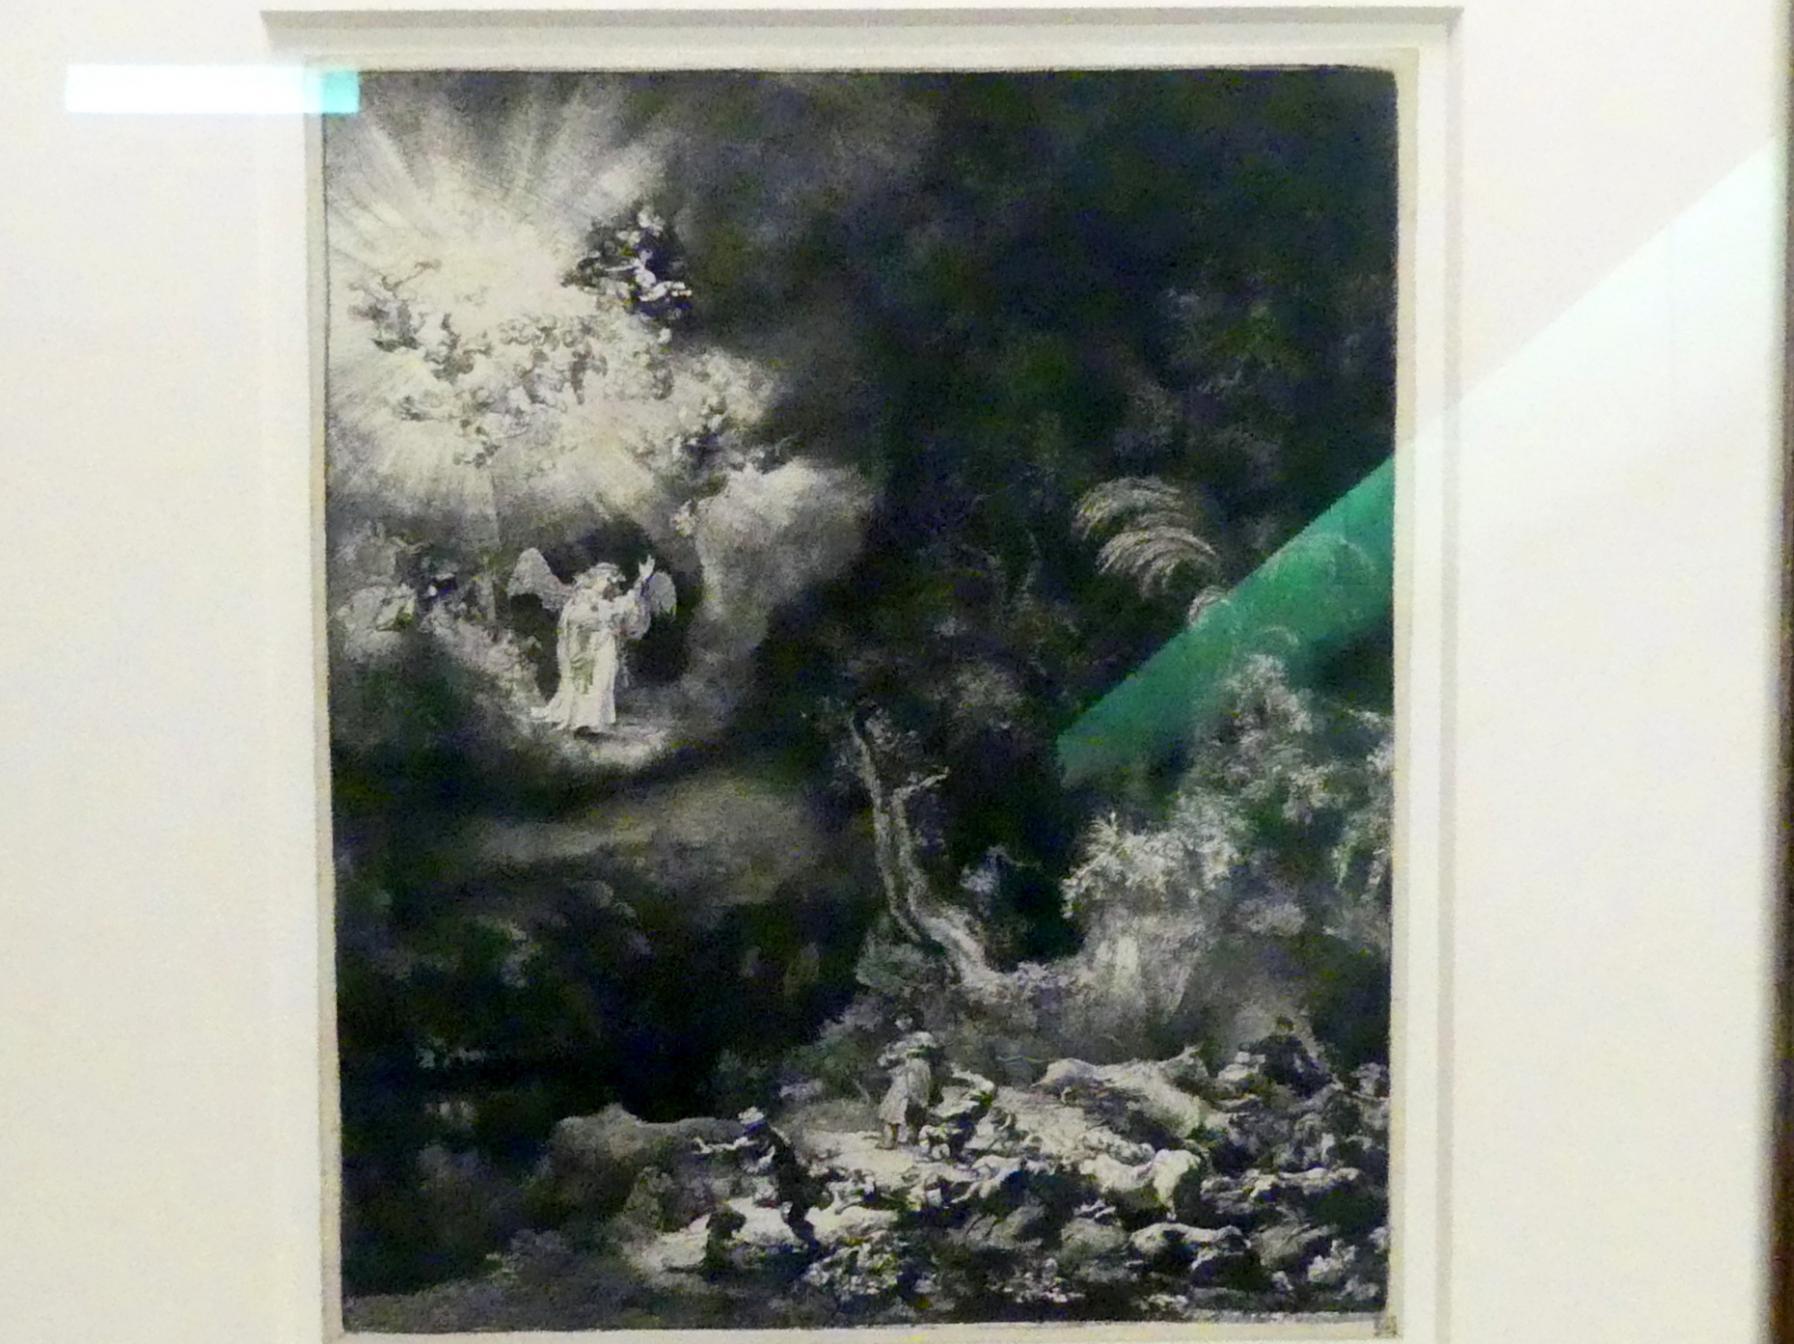 Rembrandt (Rembrandt Harmenszoon van Rijn): Verkündigung an die Hirten, 1634